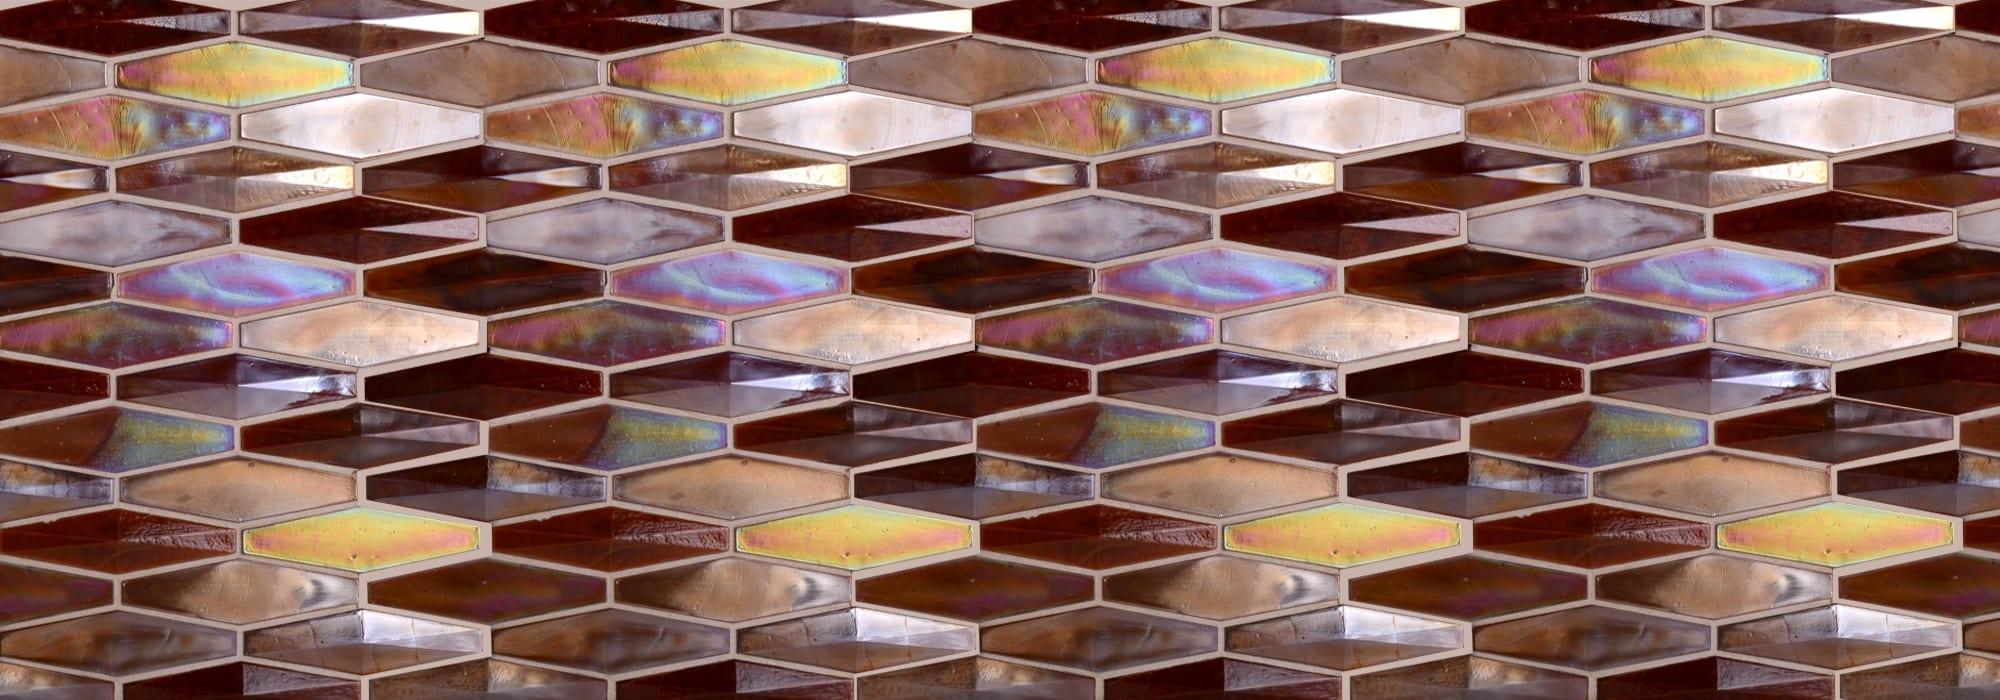 פסיפס זכוכית הארי פוטר by Milstone